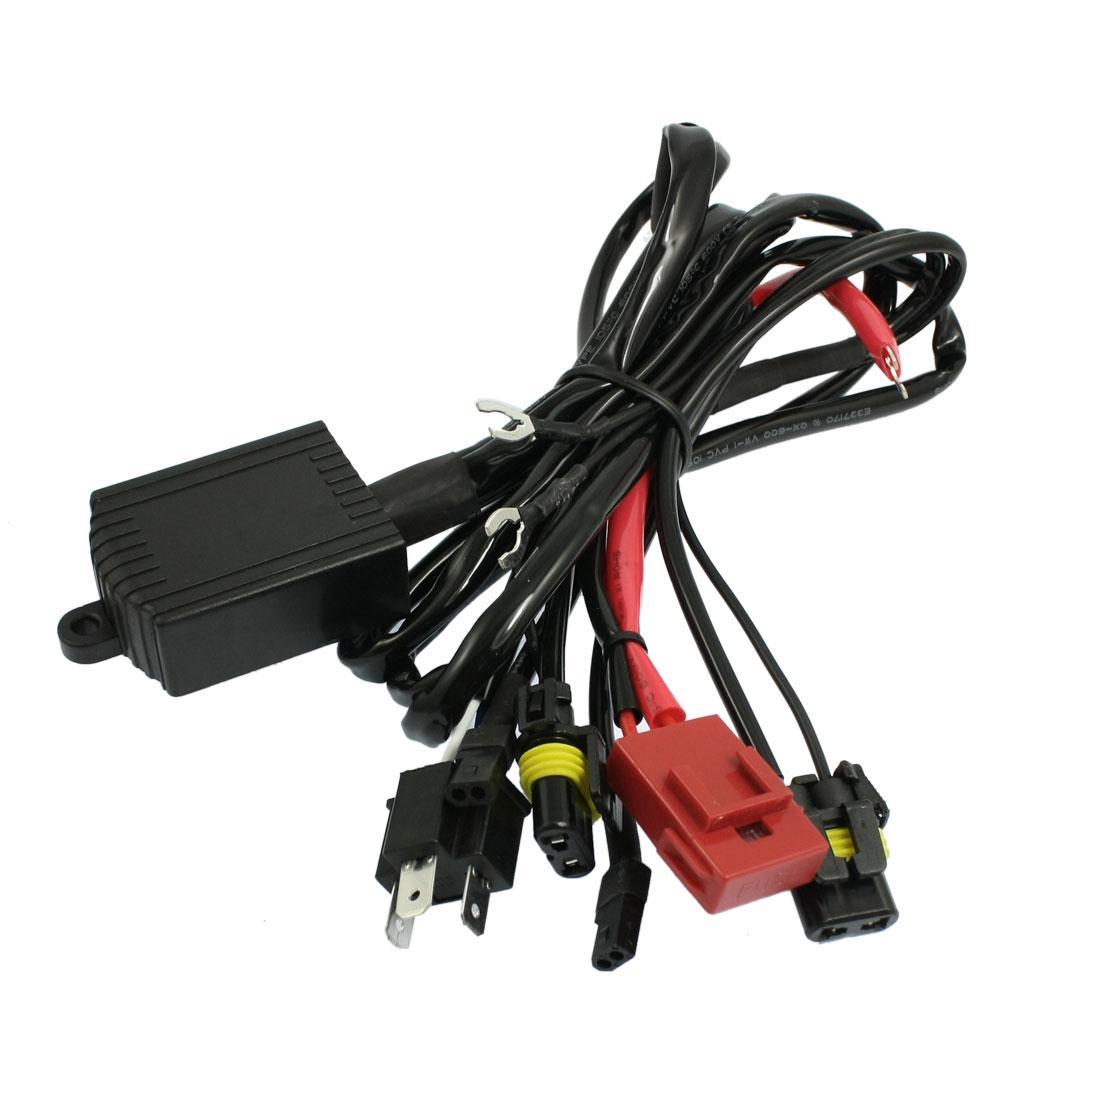 Truck Car H4 Hi/Lo Bi-Xenon Light Wiring Controller Fuse Relay Harness